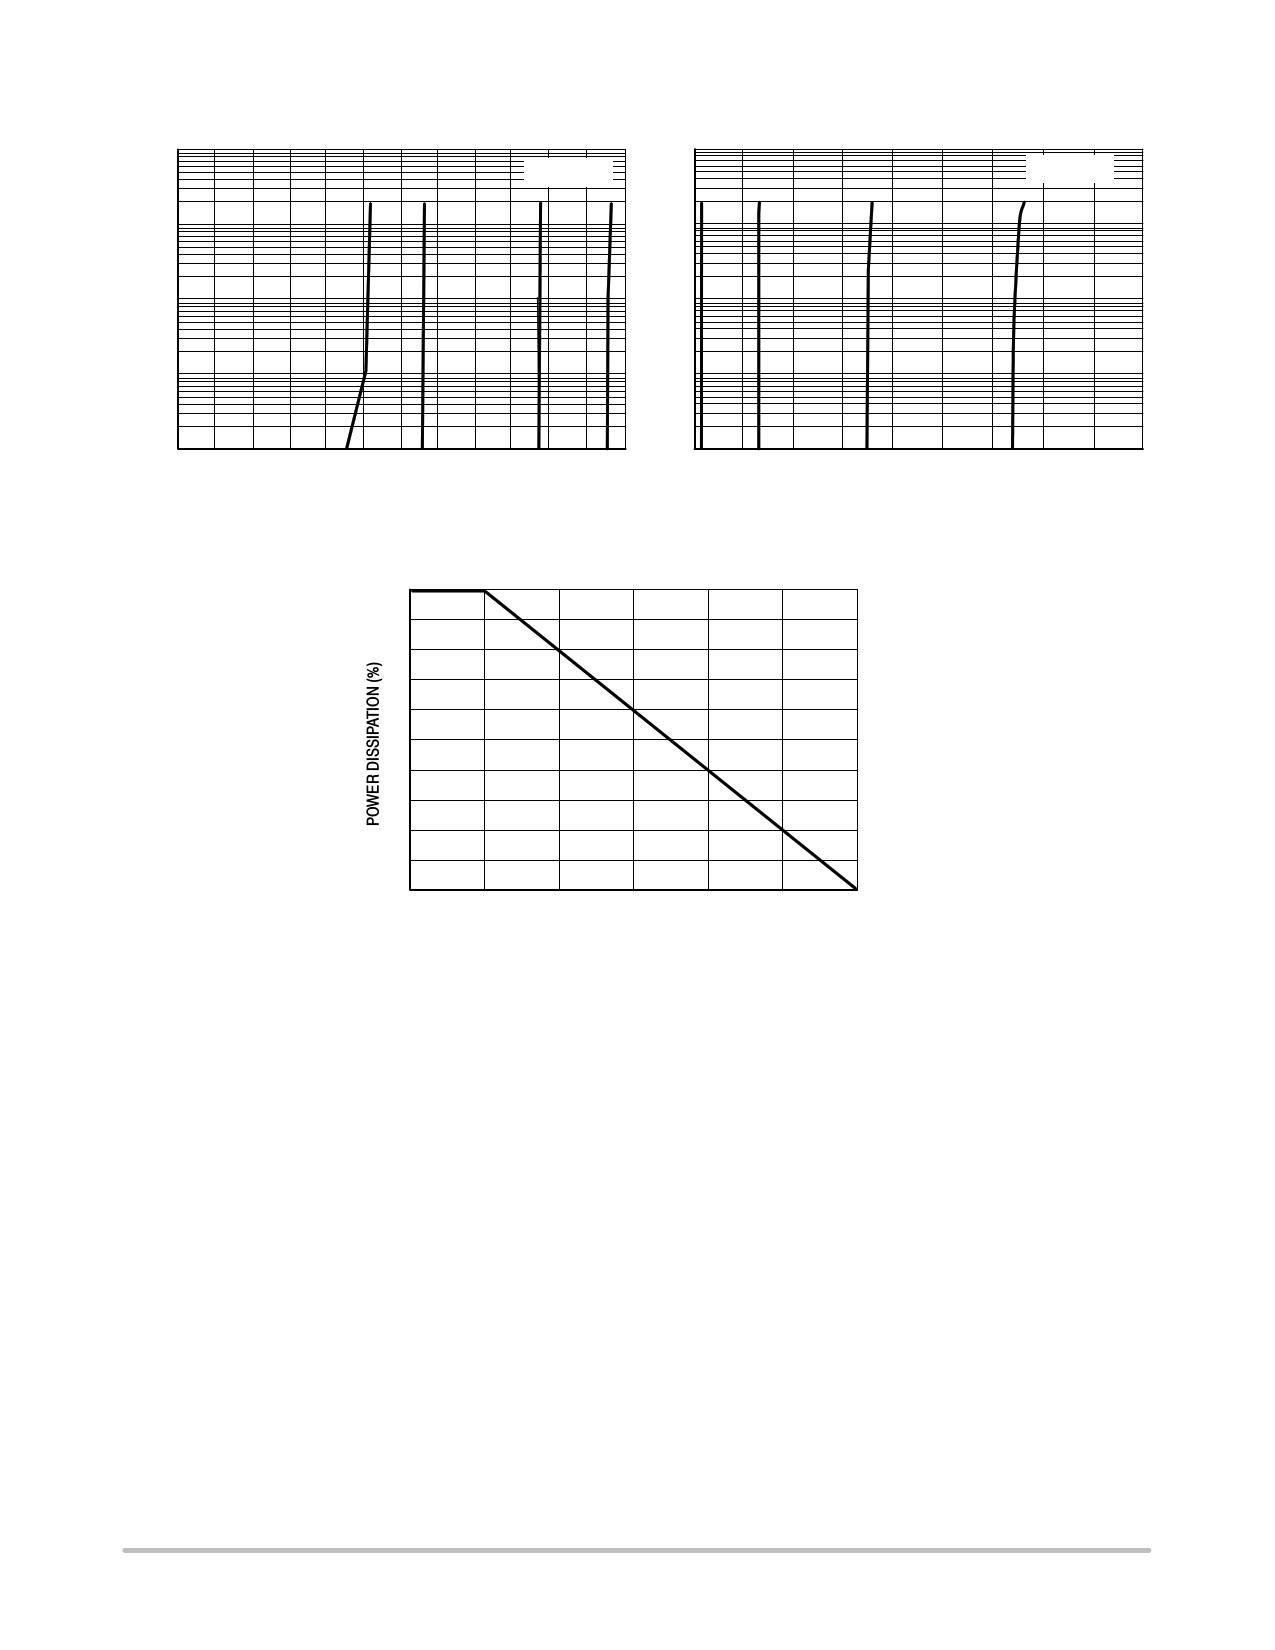 MM3Z9V1T1 equivalent